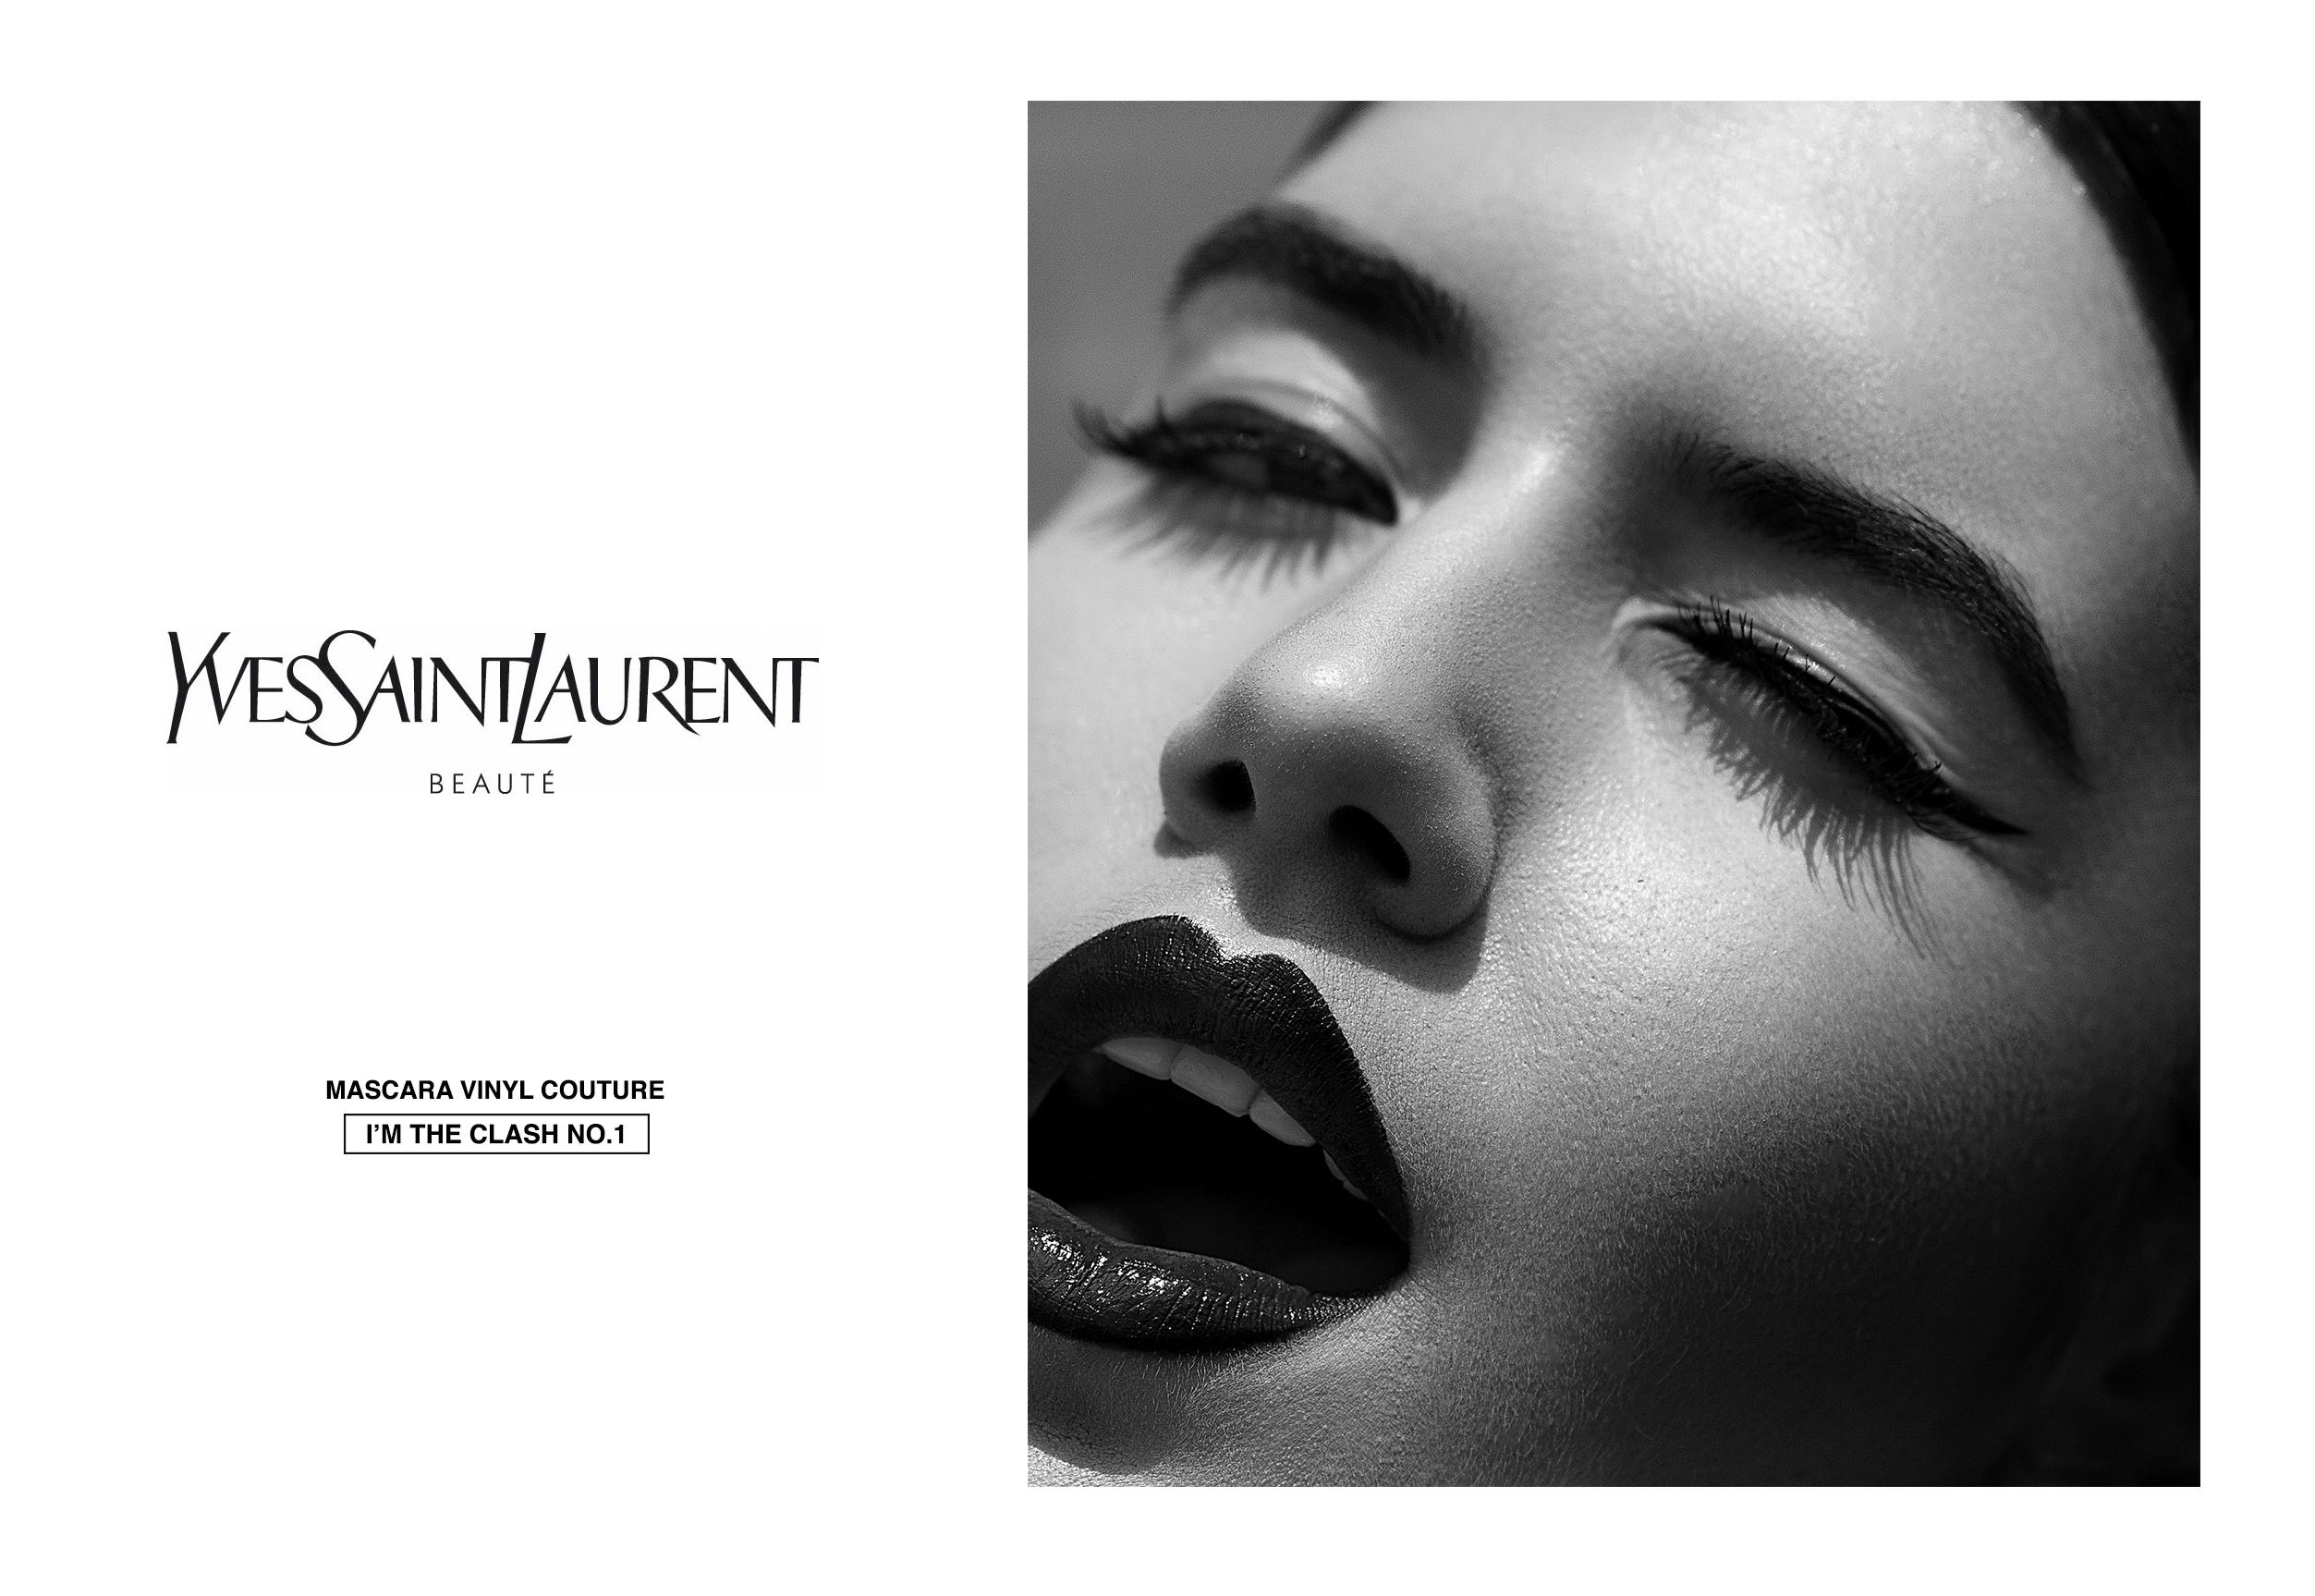 YSL_mascara_vinyl_couture-2